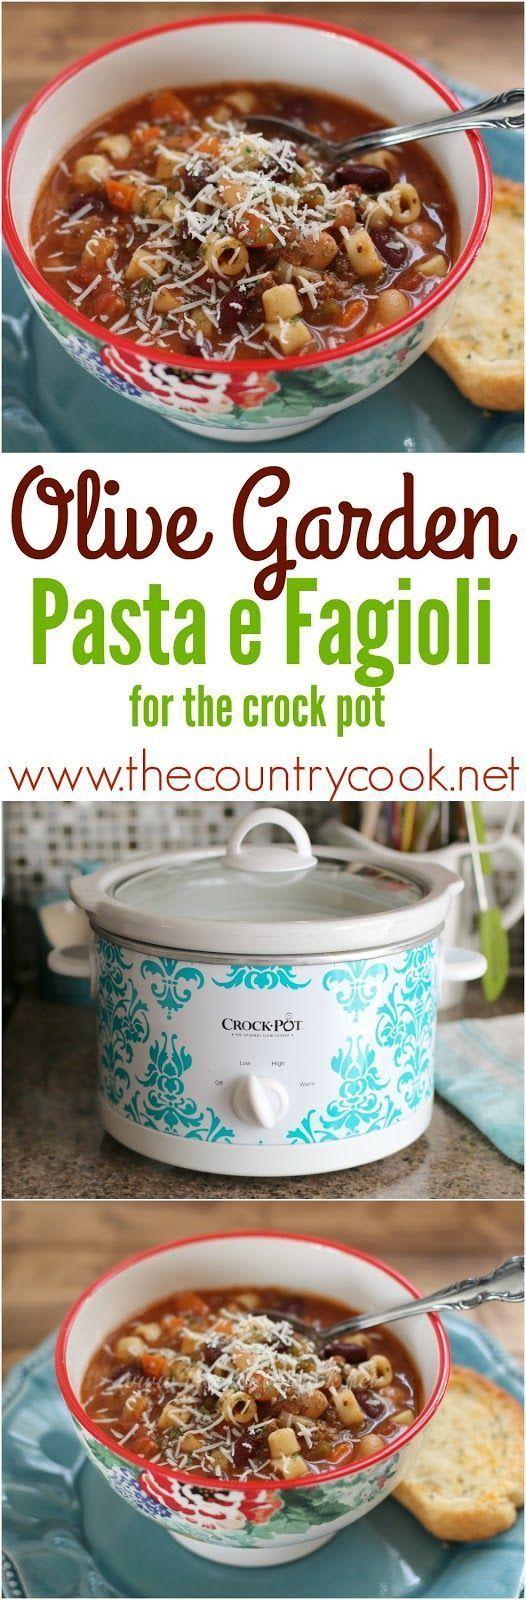 Olive garden pasta e fagioli soup Recipe Food recipes